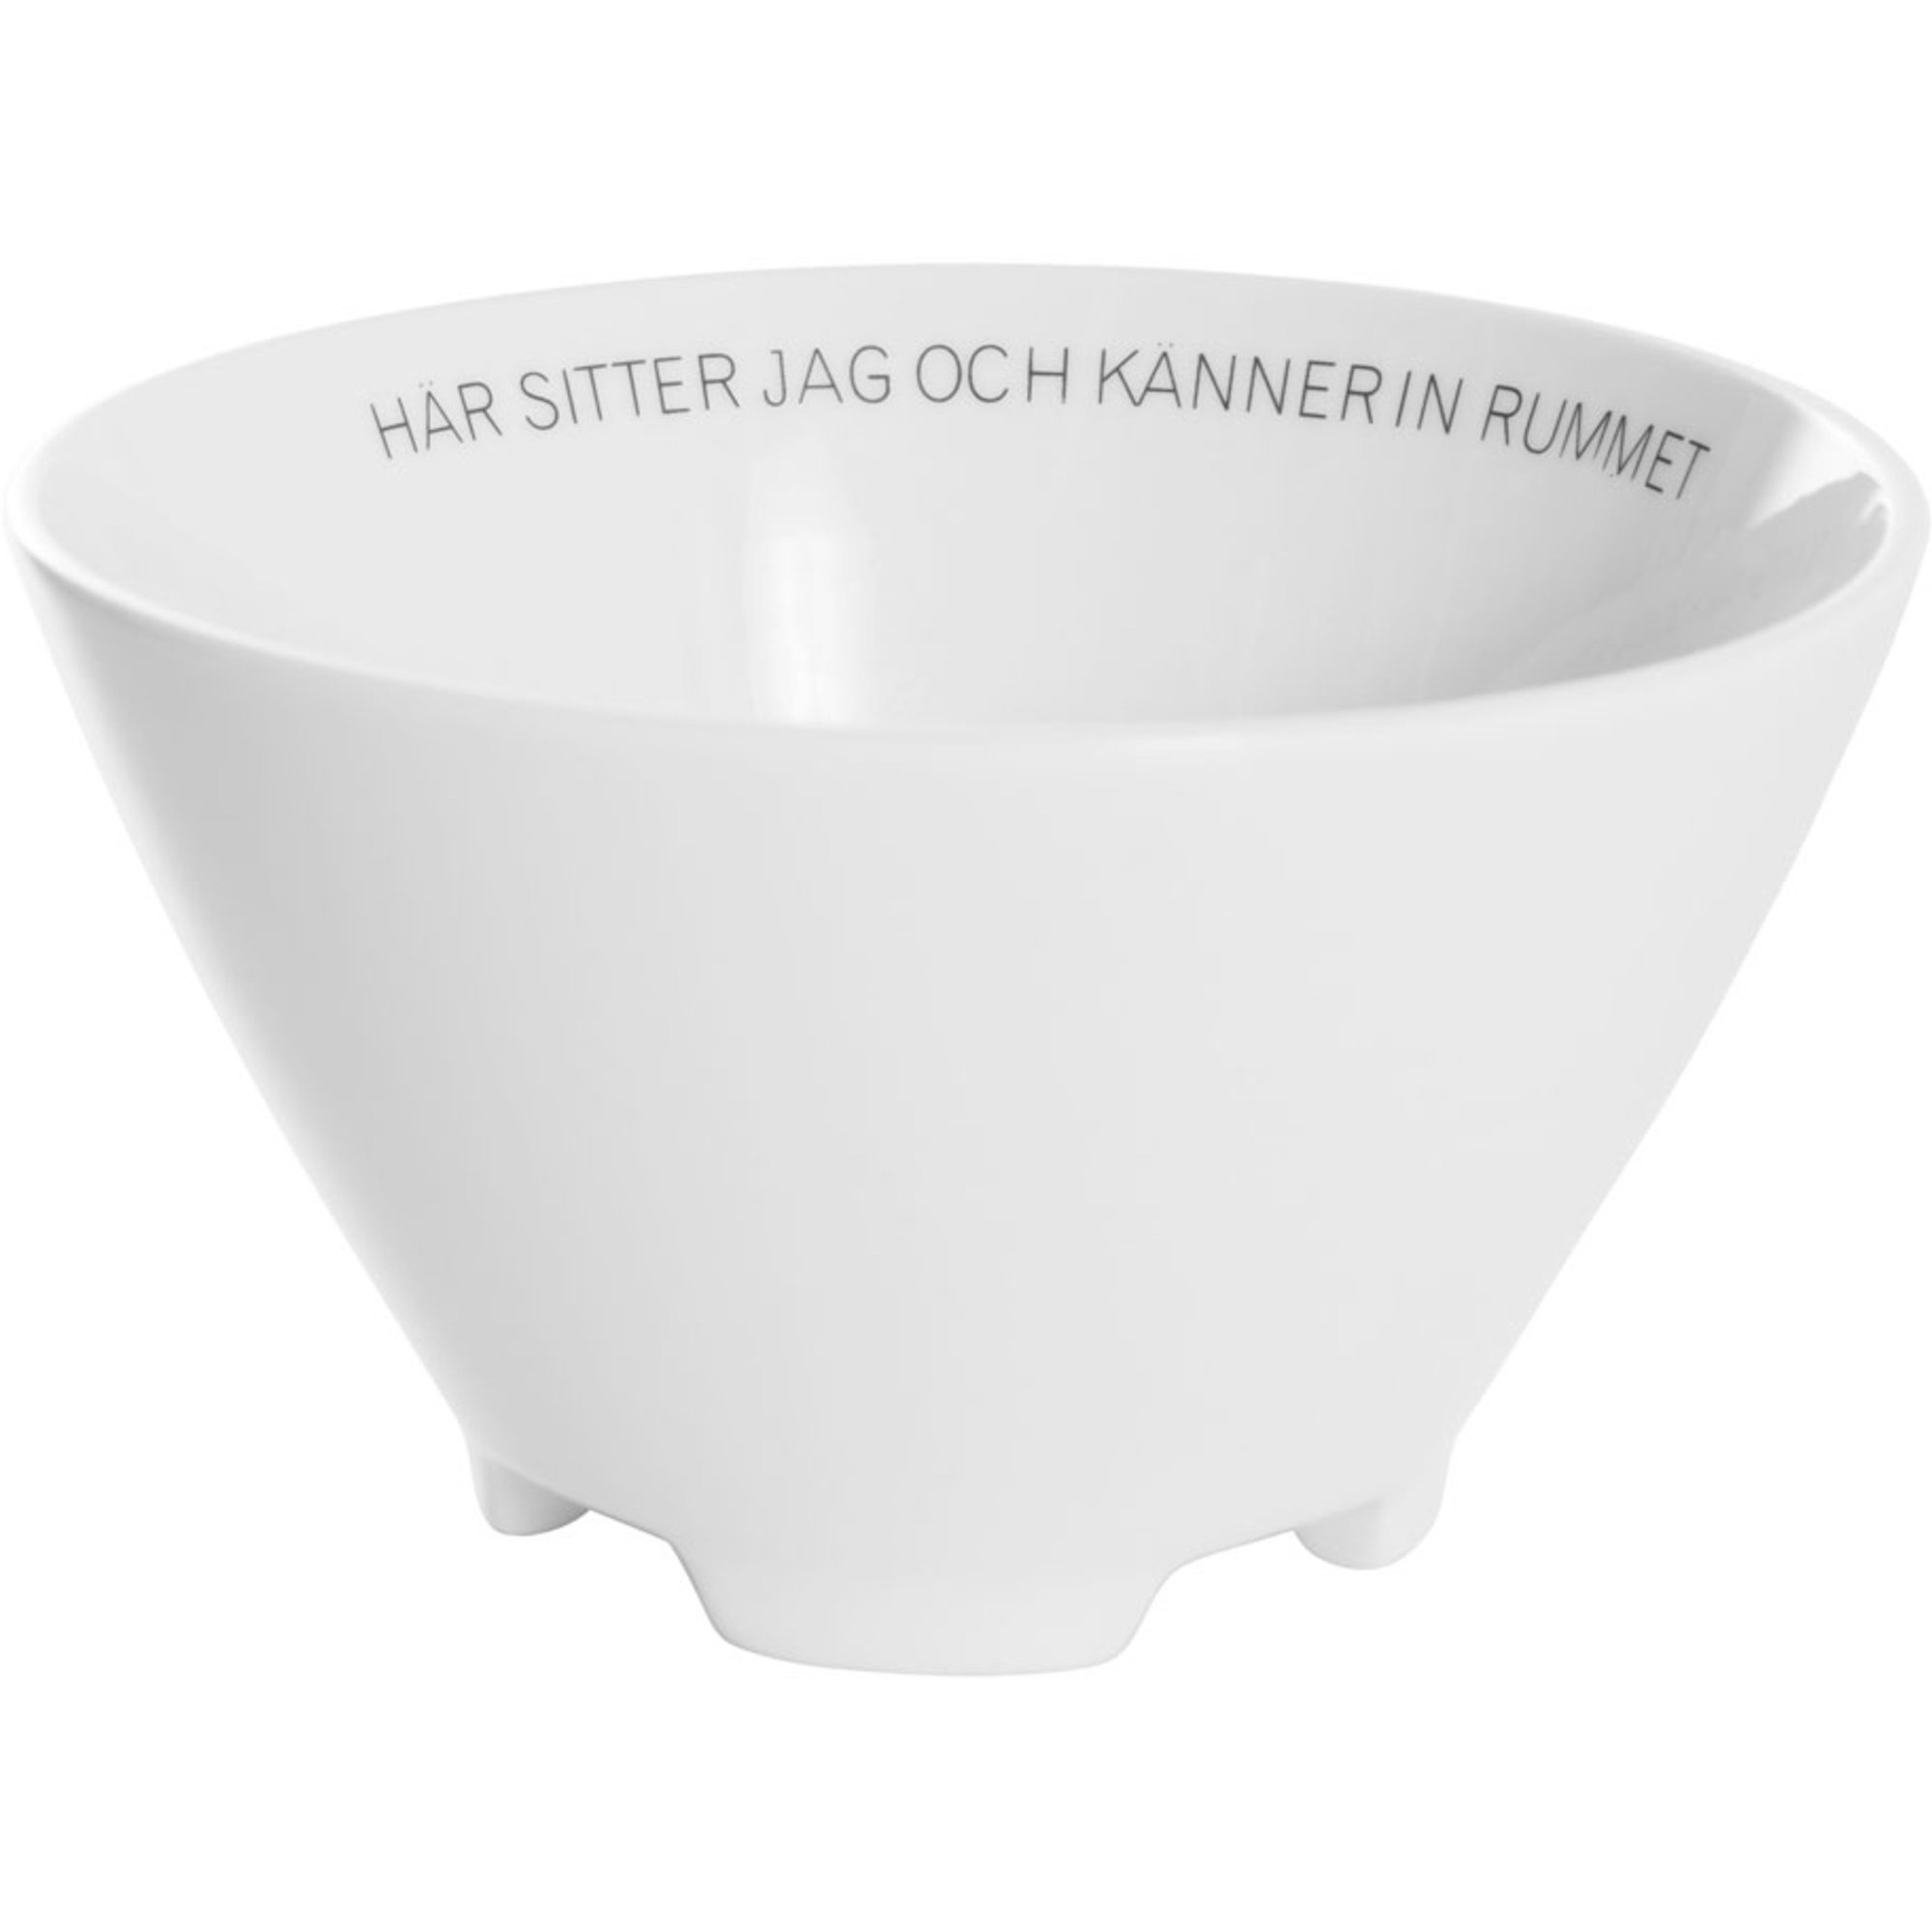 Ernst Skål 'Rummet'